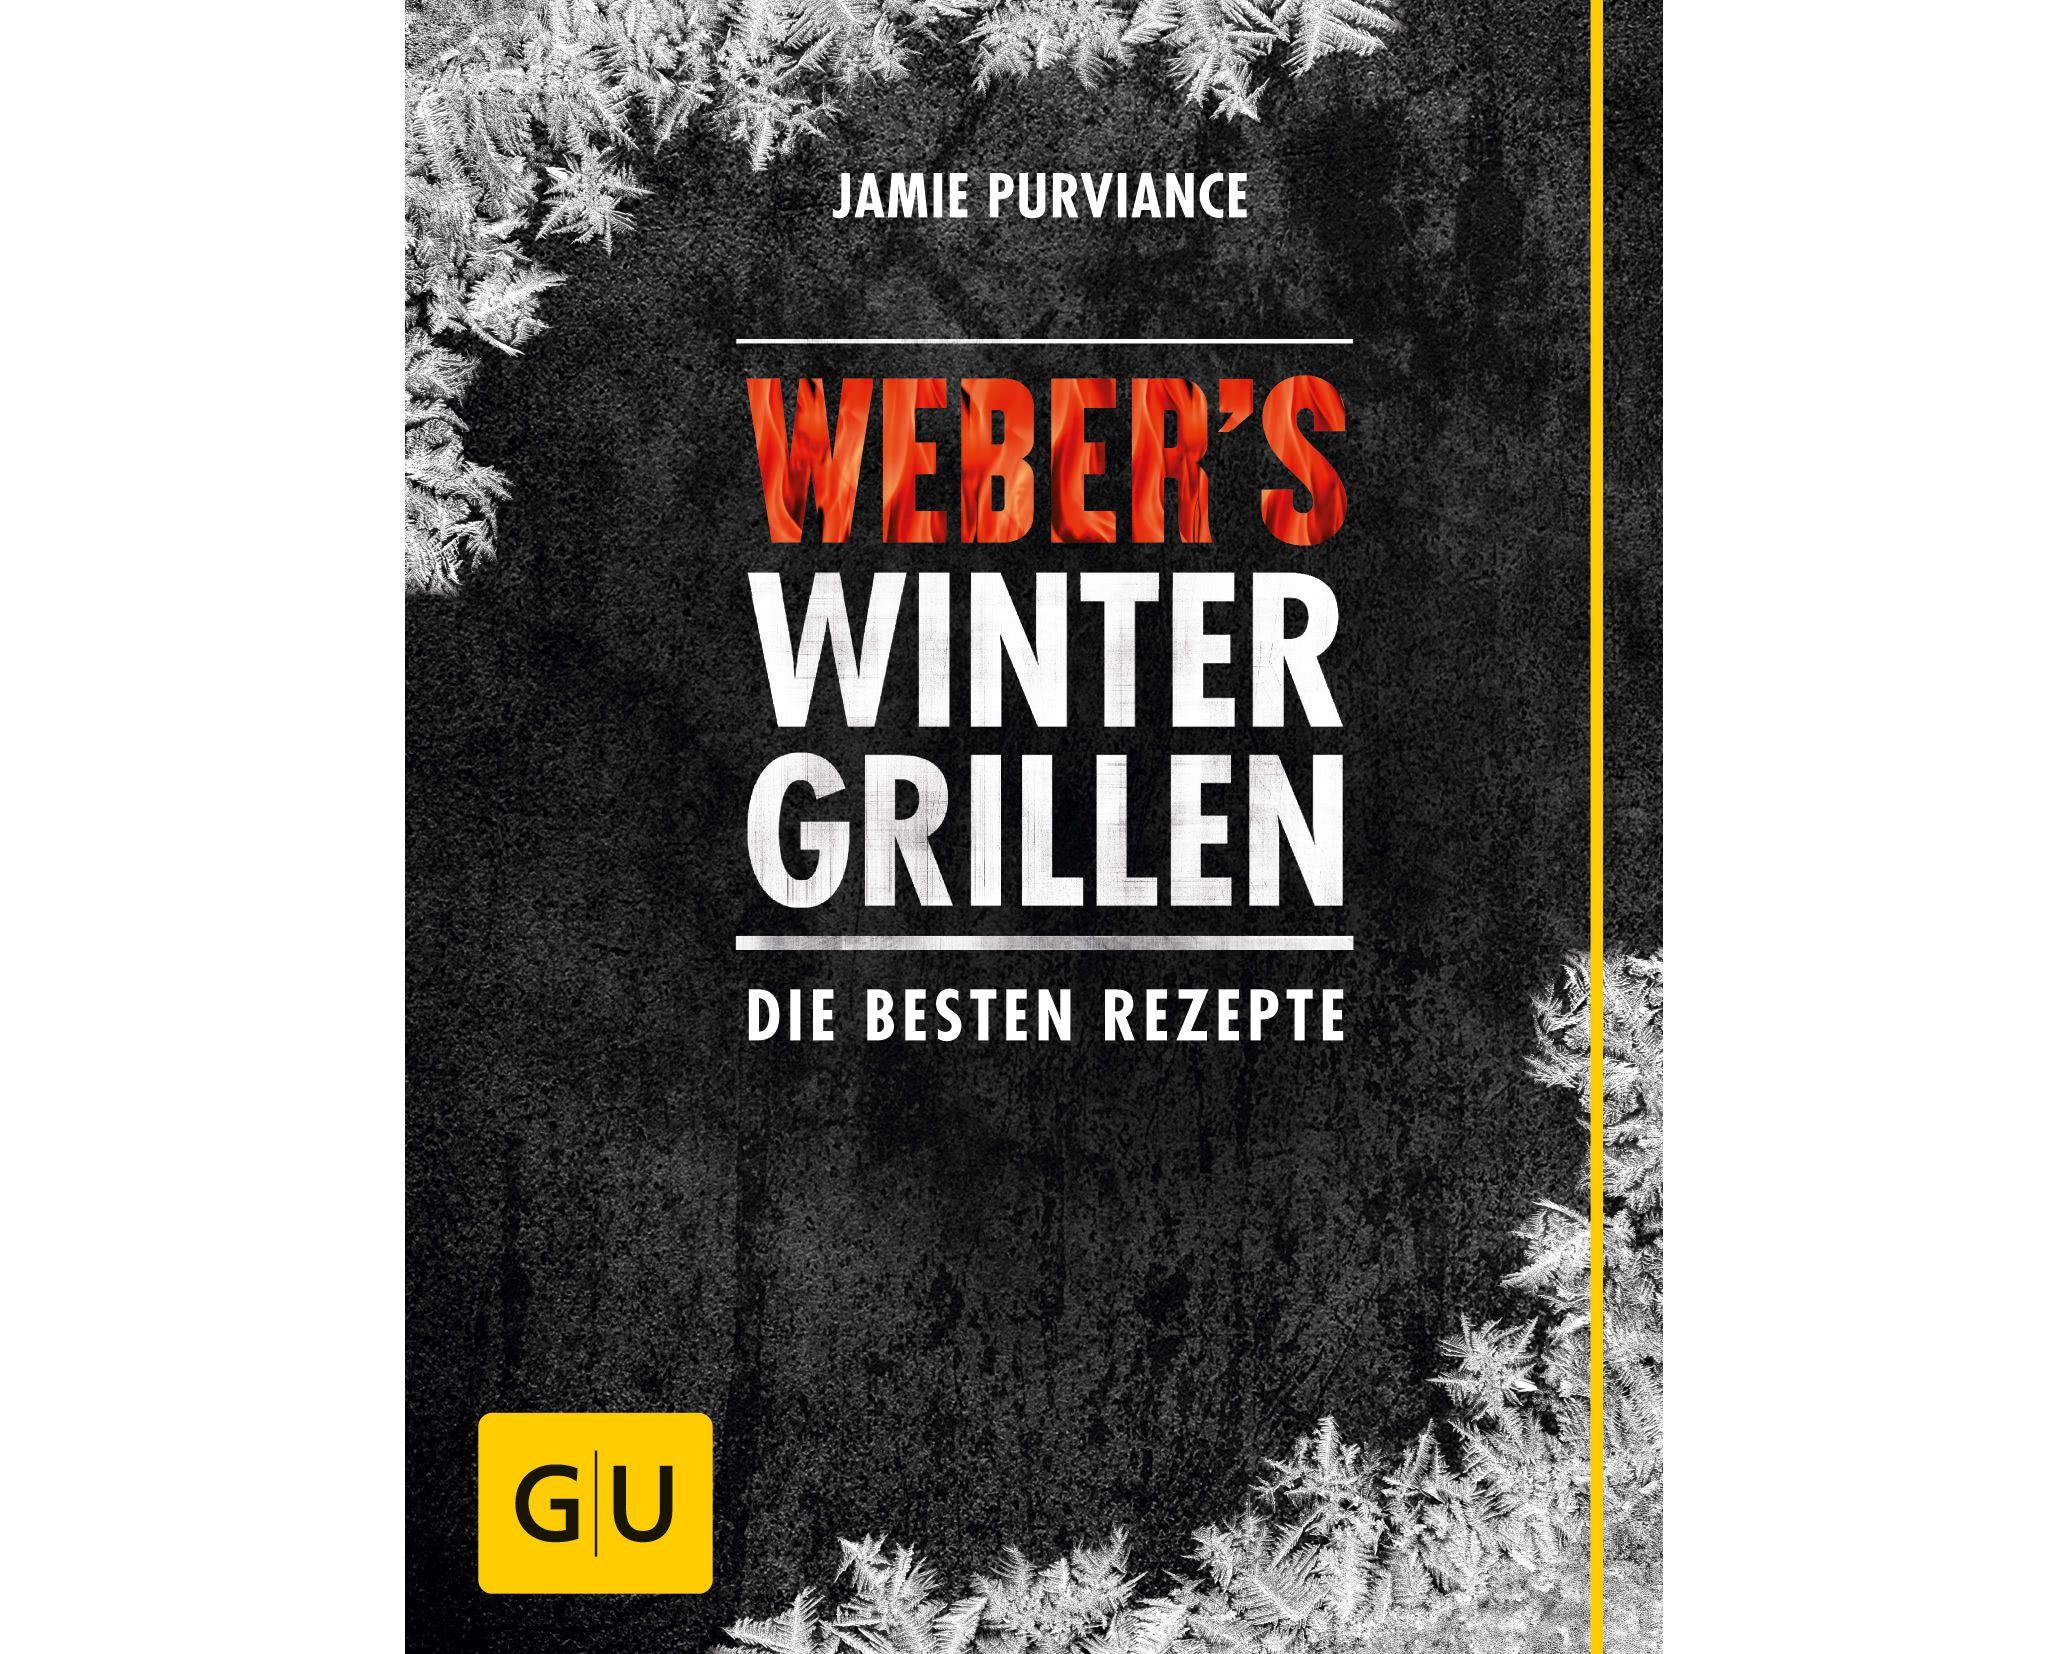 Webers® Wintergrillen, Buch